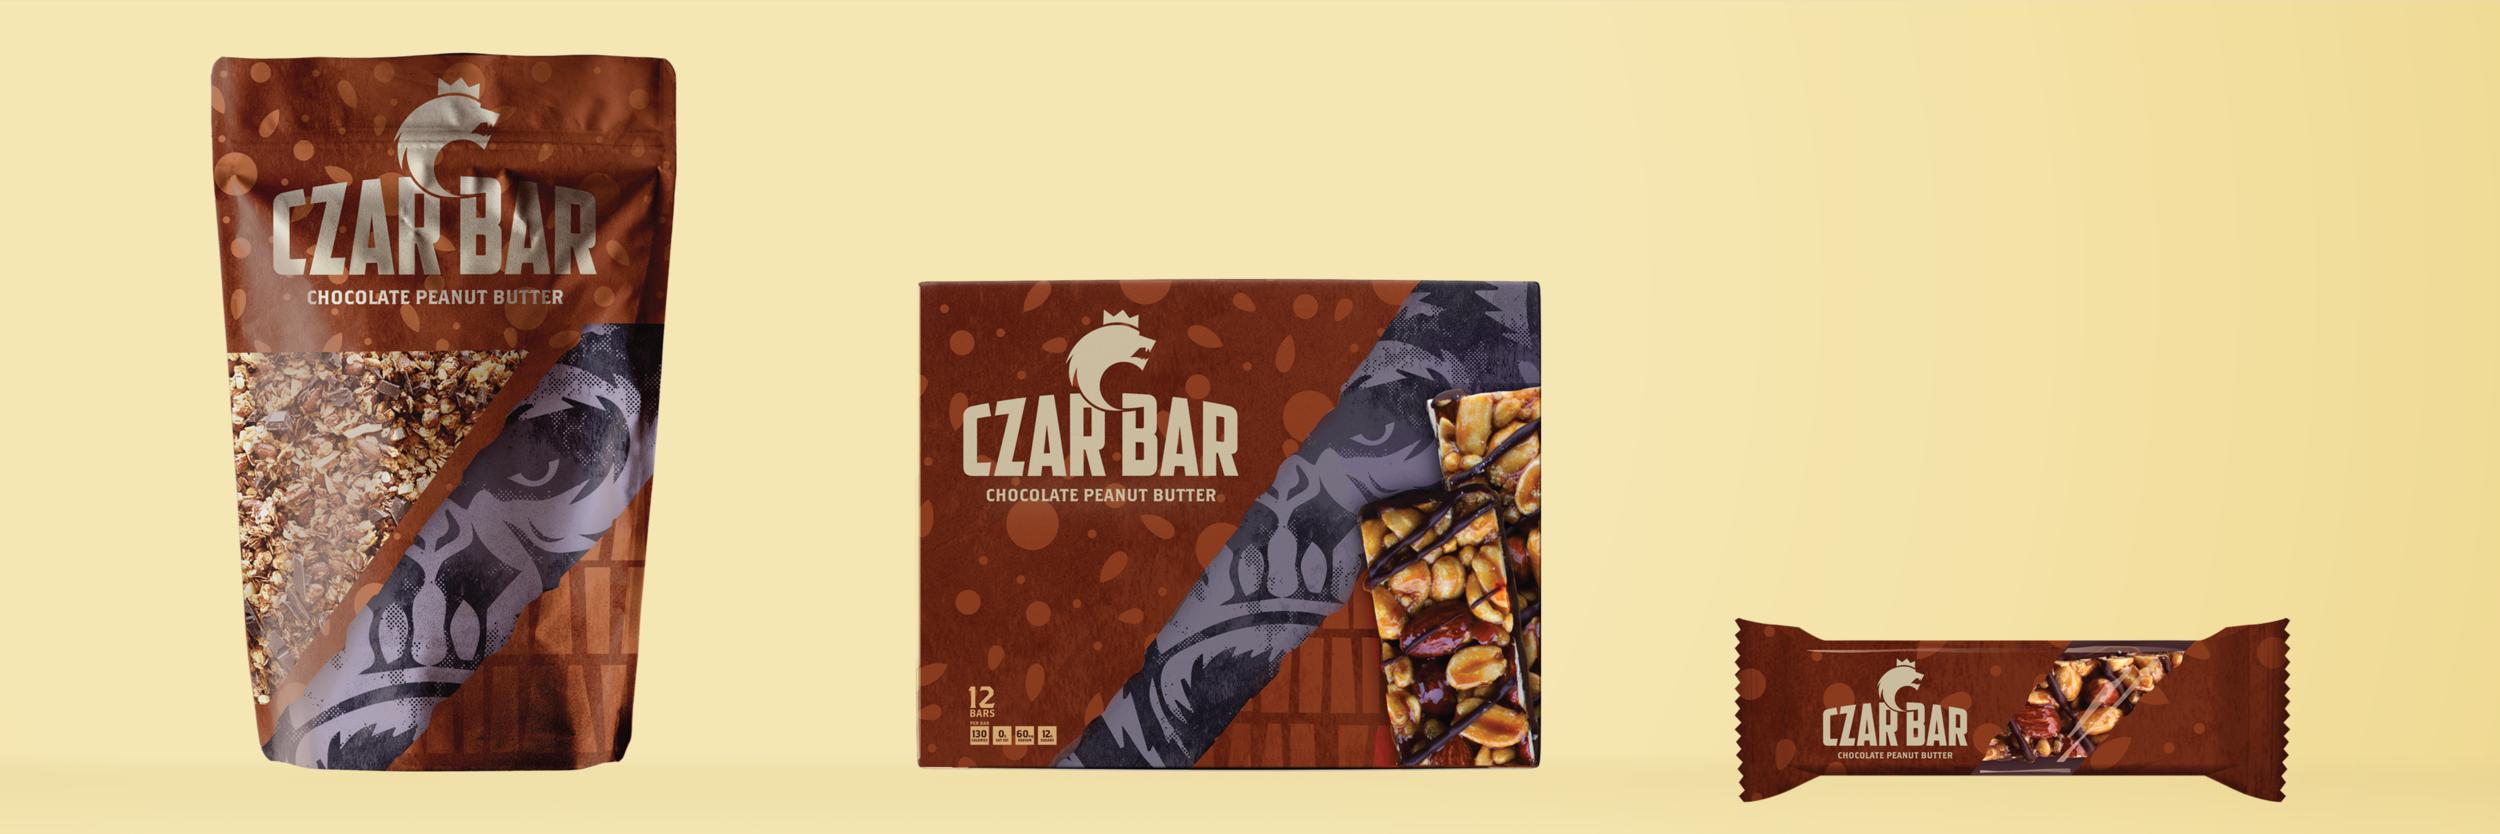 20x60_CzarBar-03.png